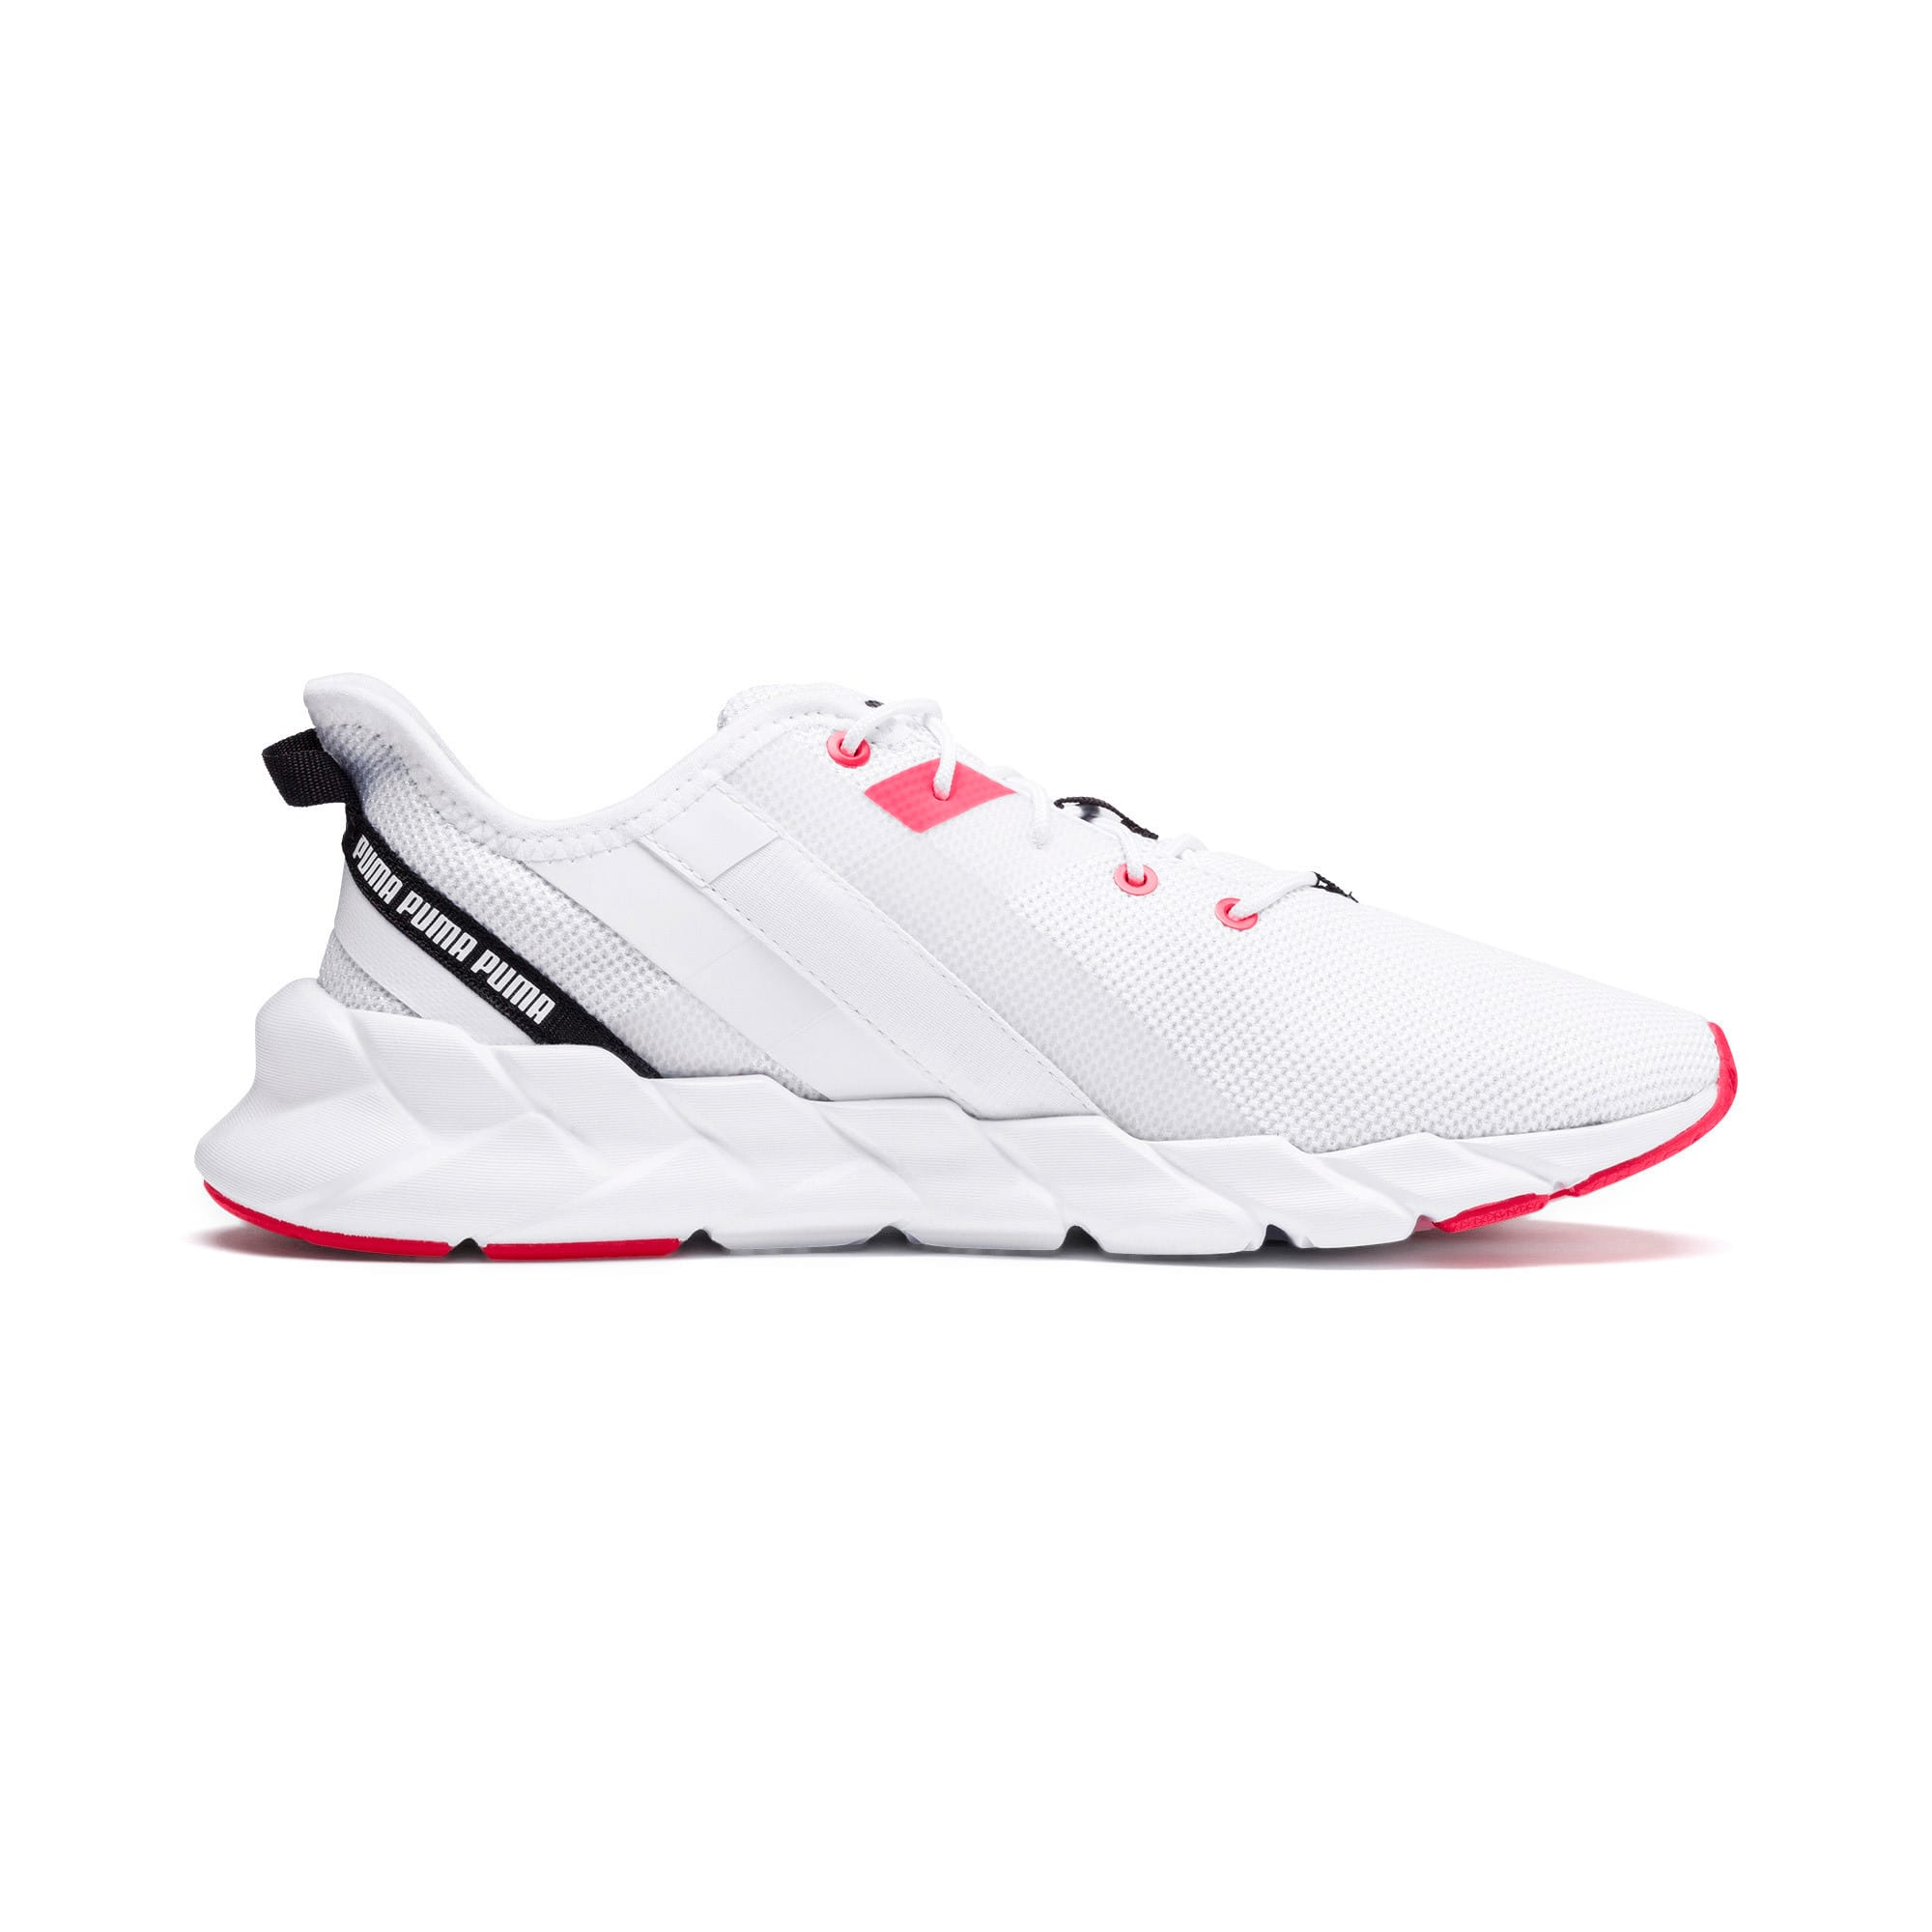 Thumbnail 6 of Weave XT Women's Training Shoes, Puma White-Pink Alert, medium